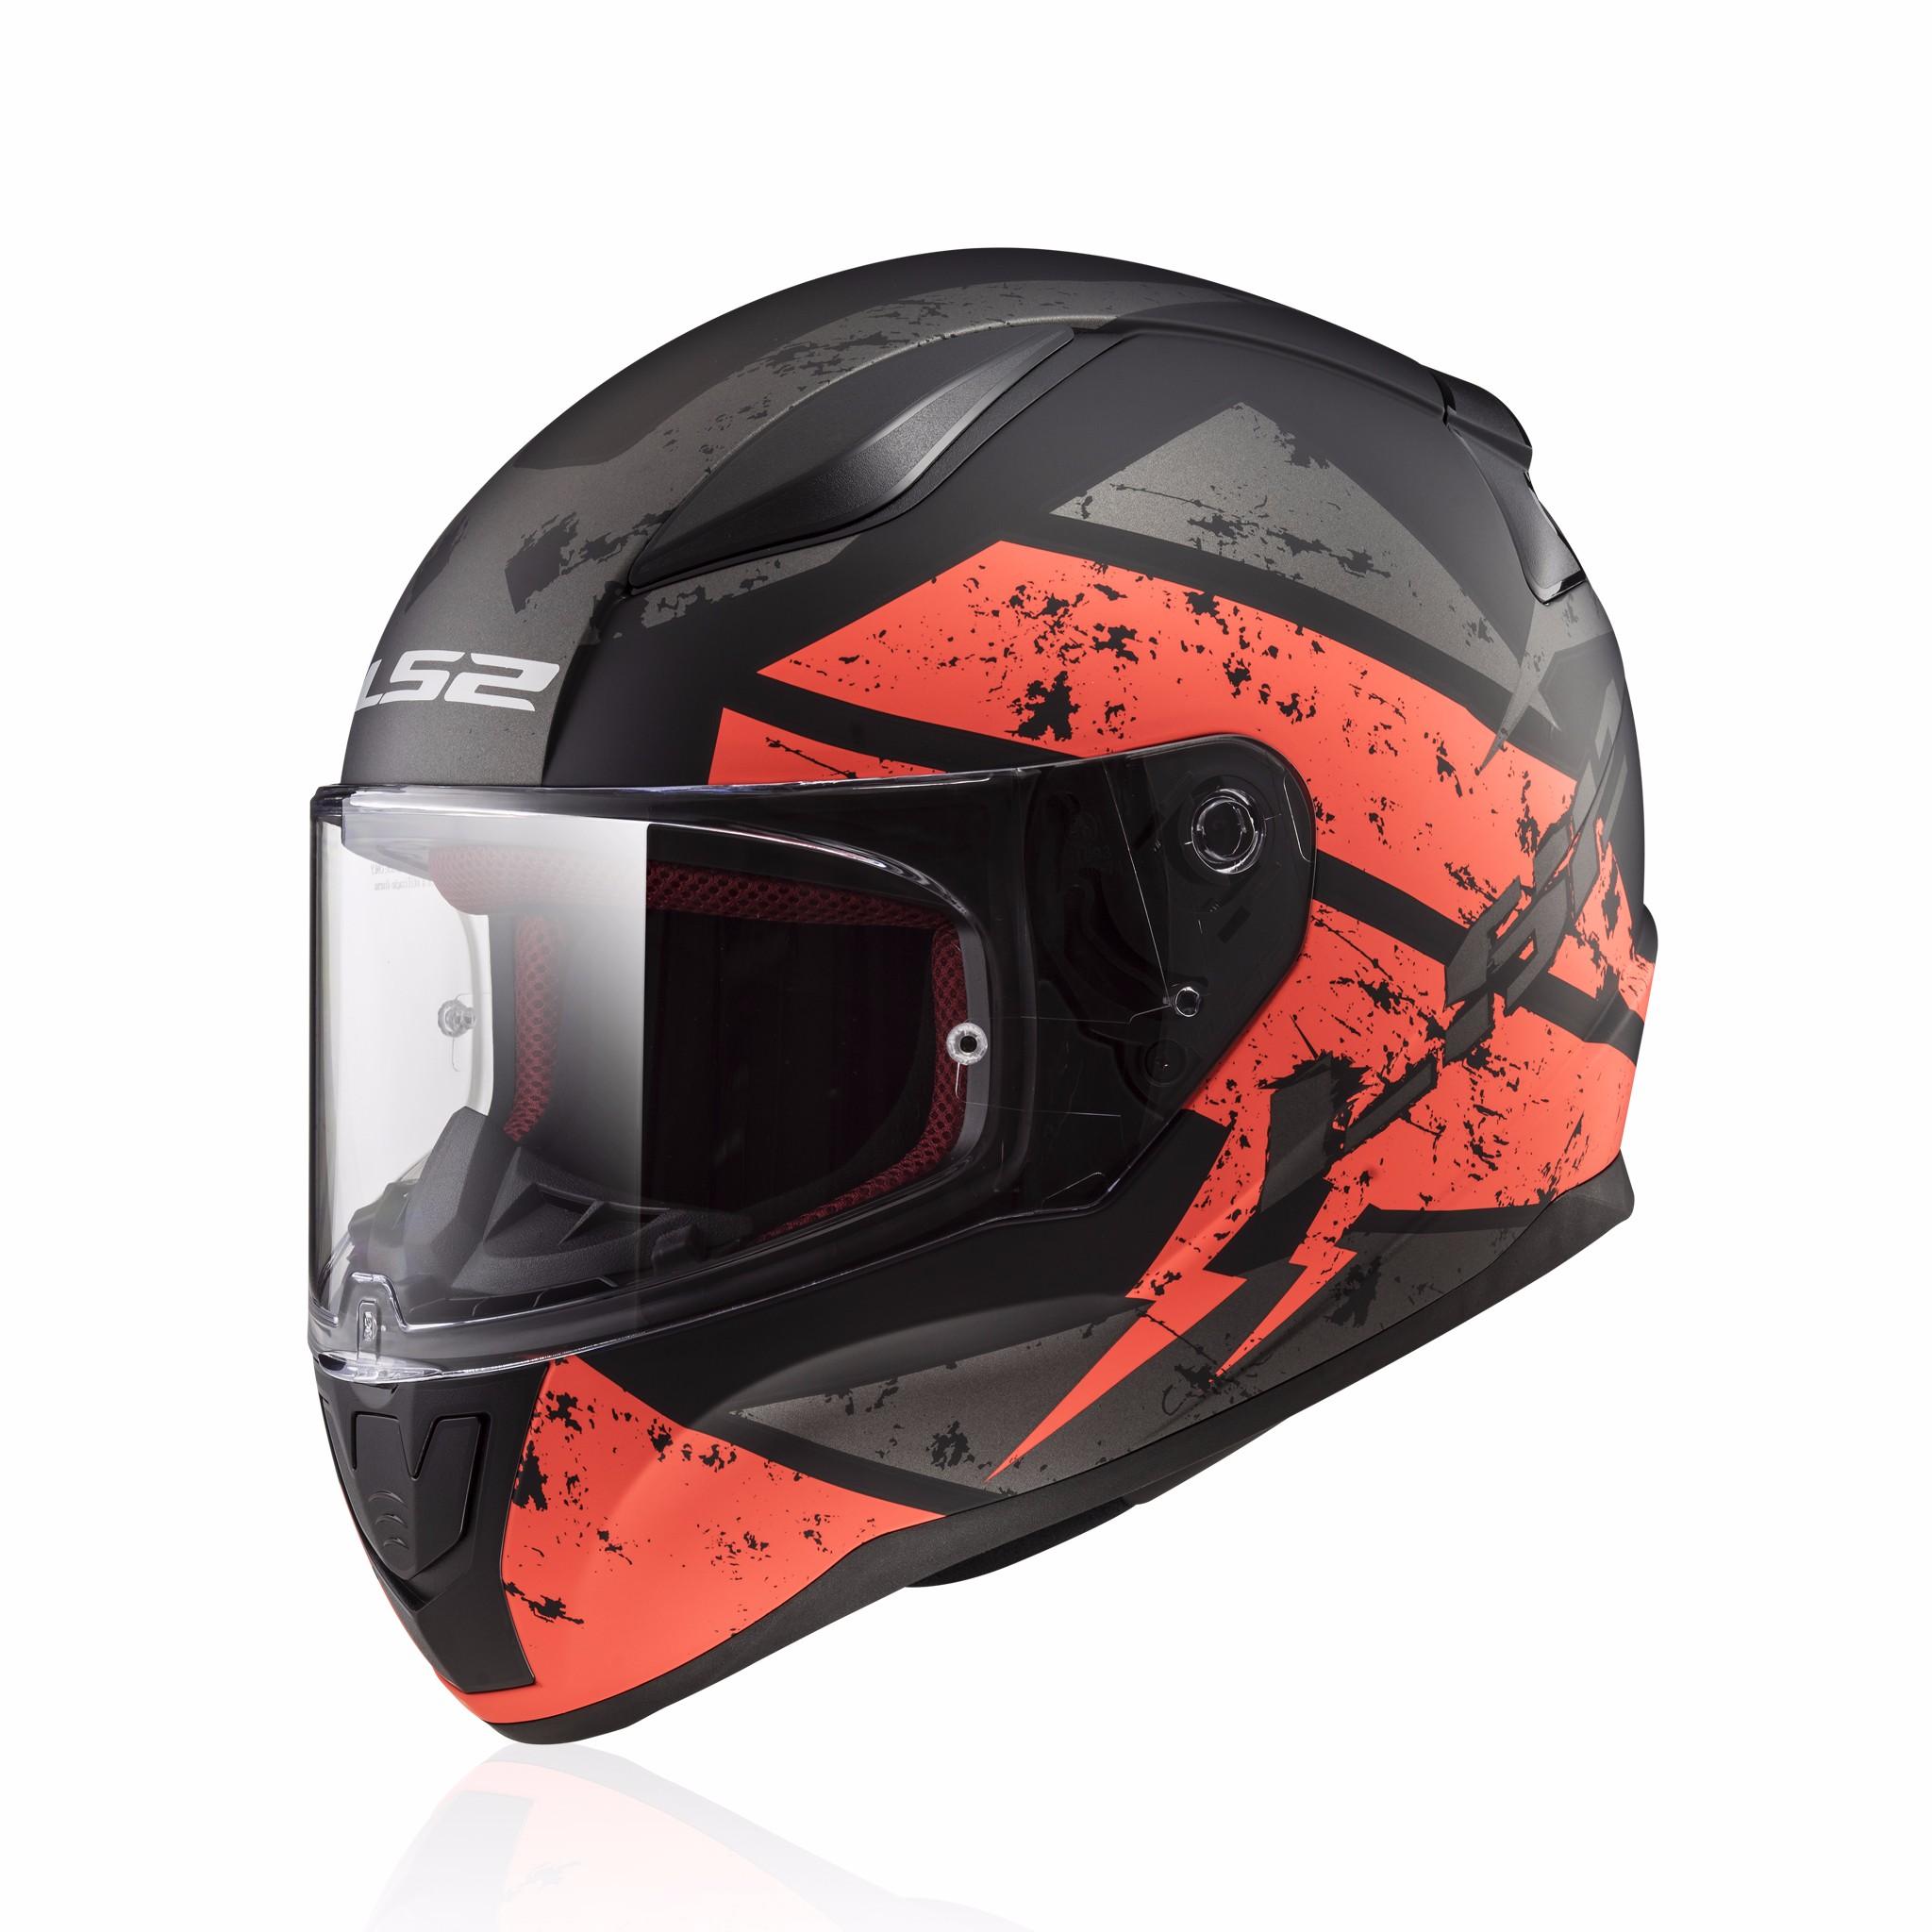 Mũ bảo hiểm fullface LS2 Rapid FF353 đen cam